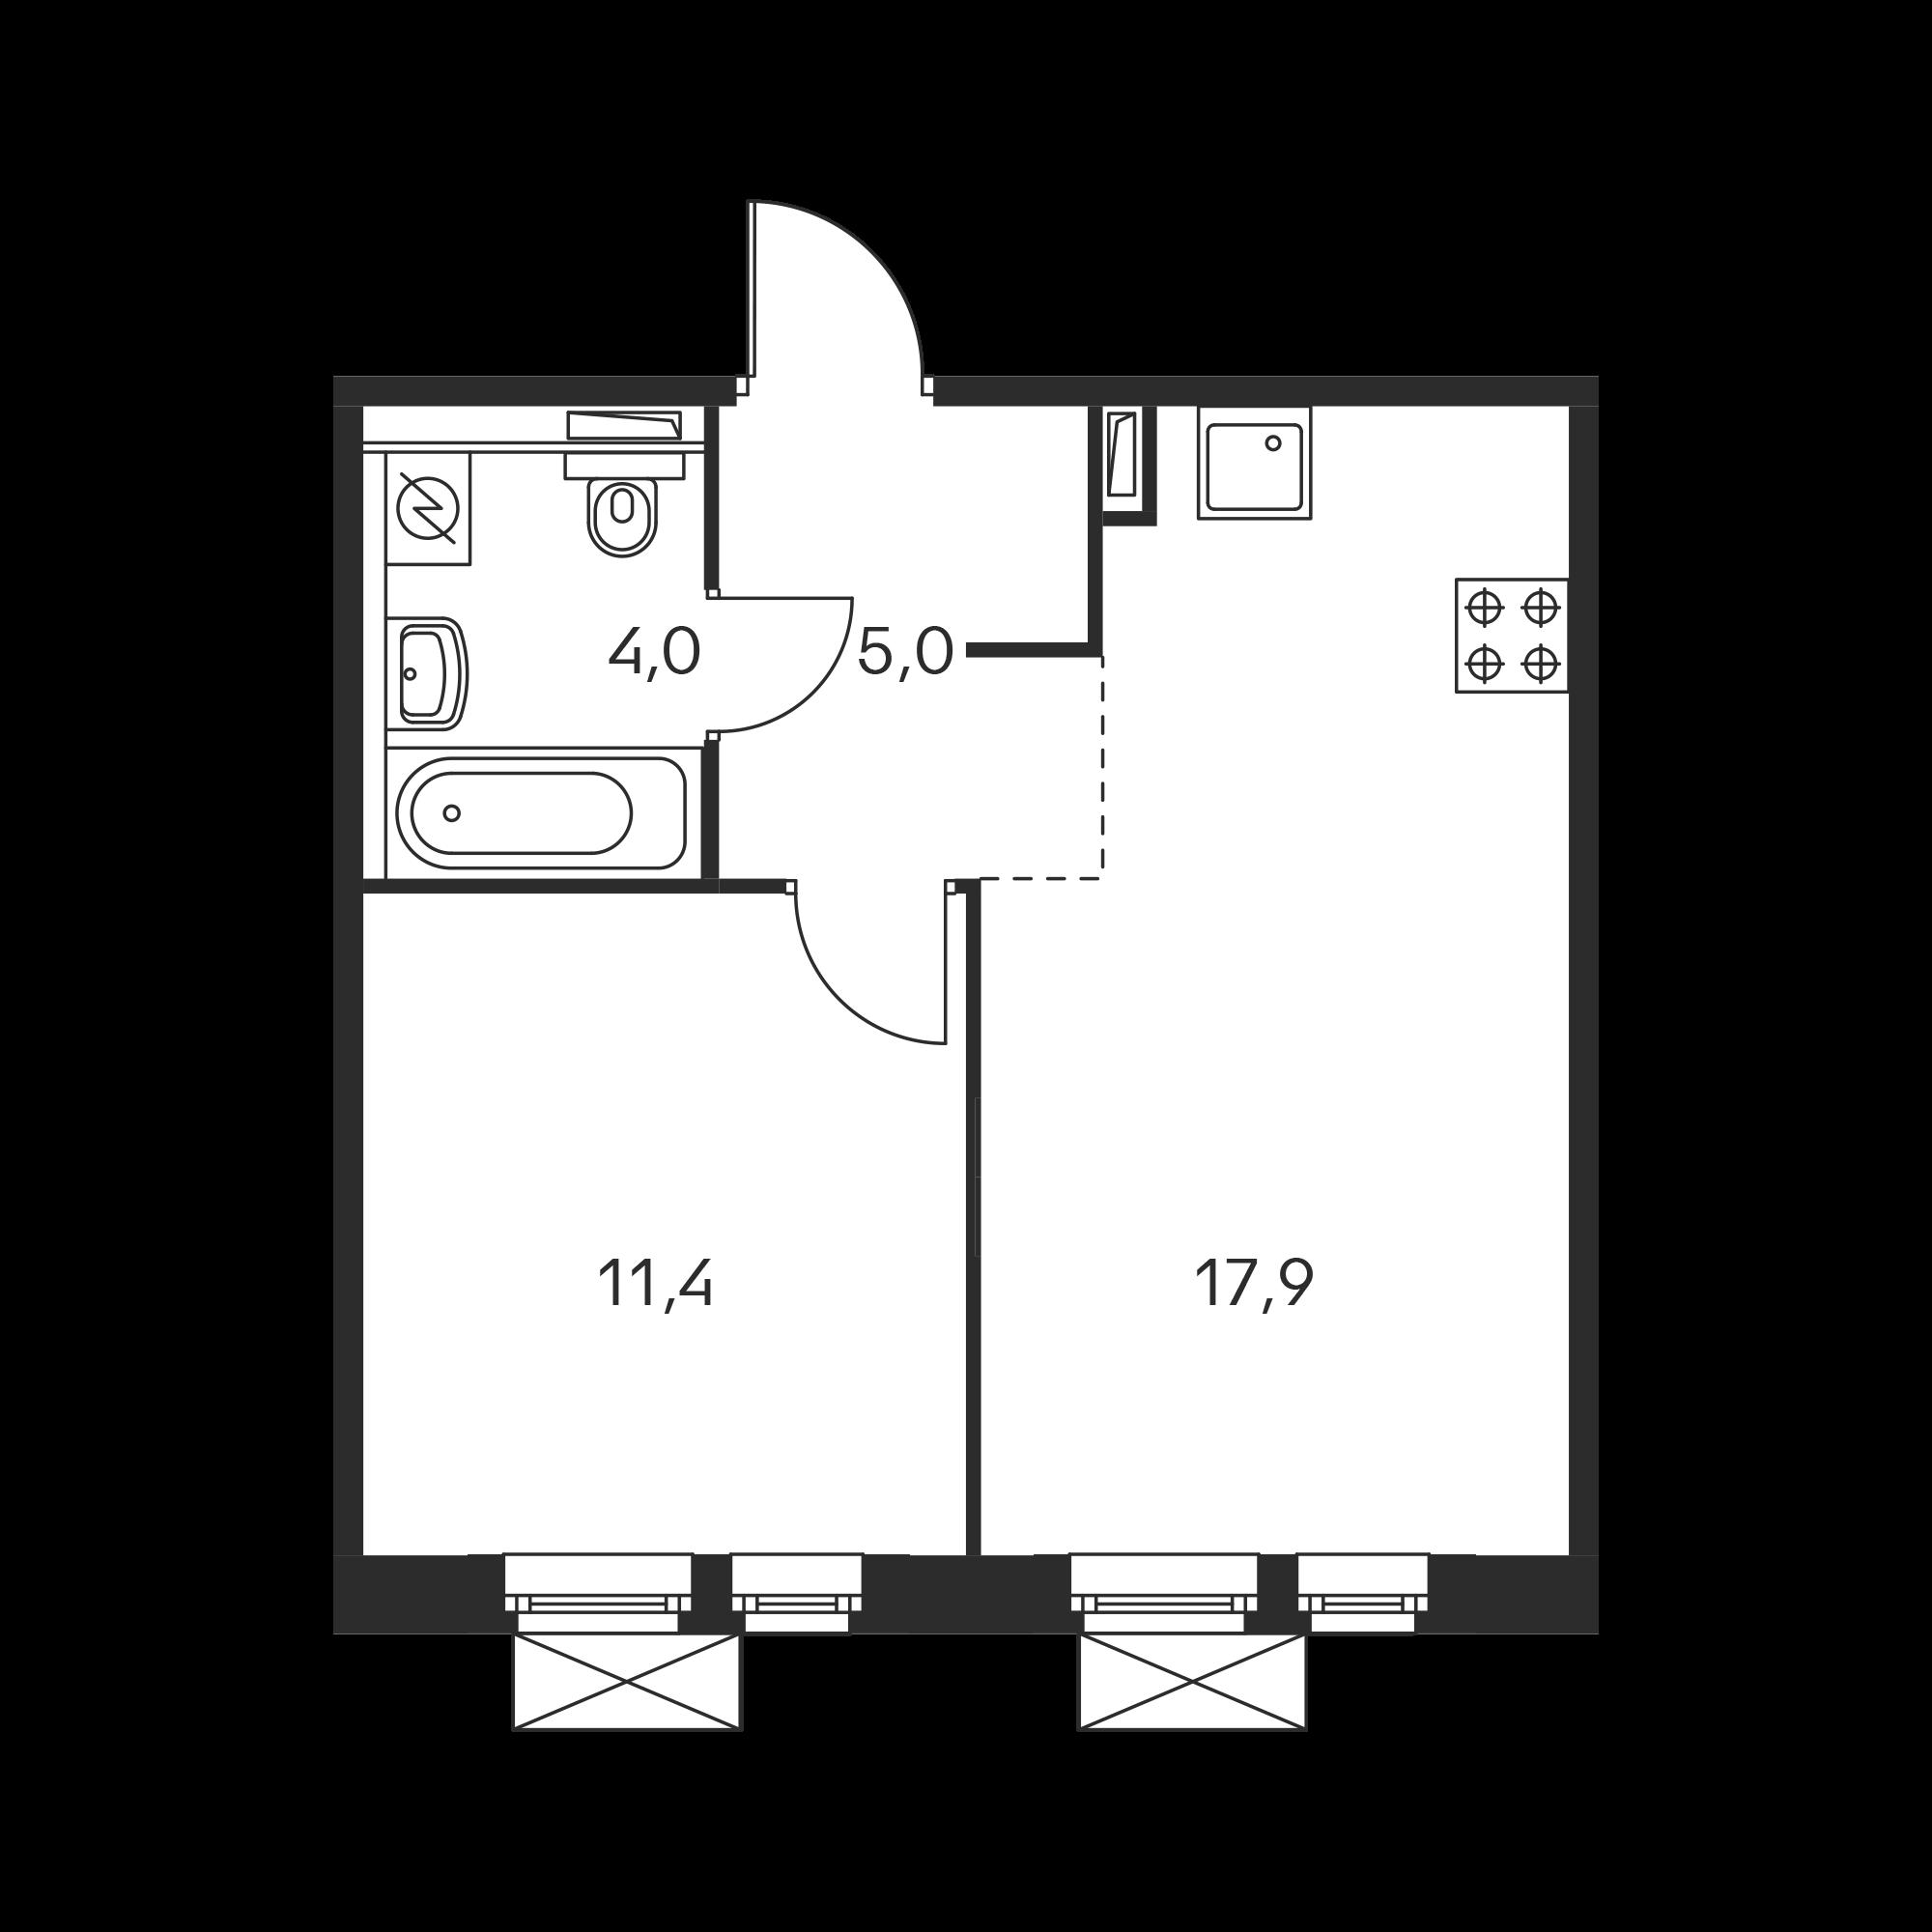 1EM5_6.6-2